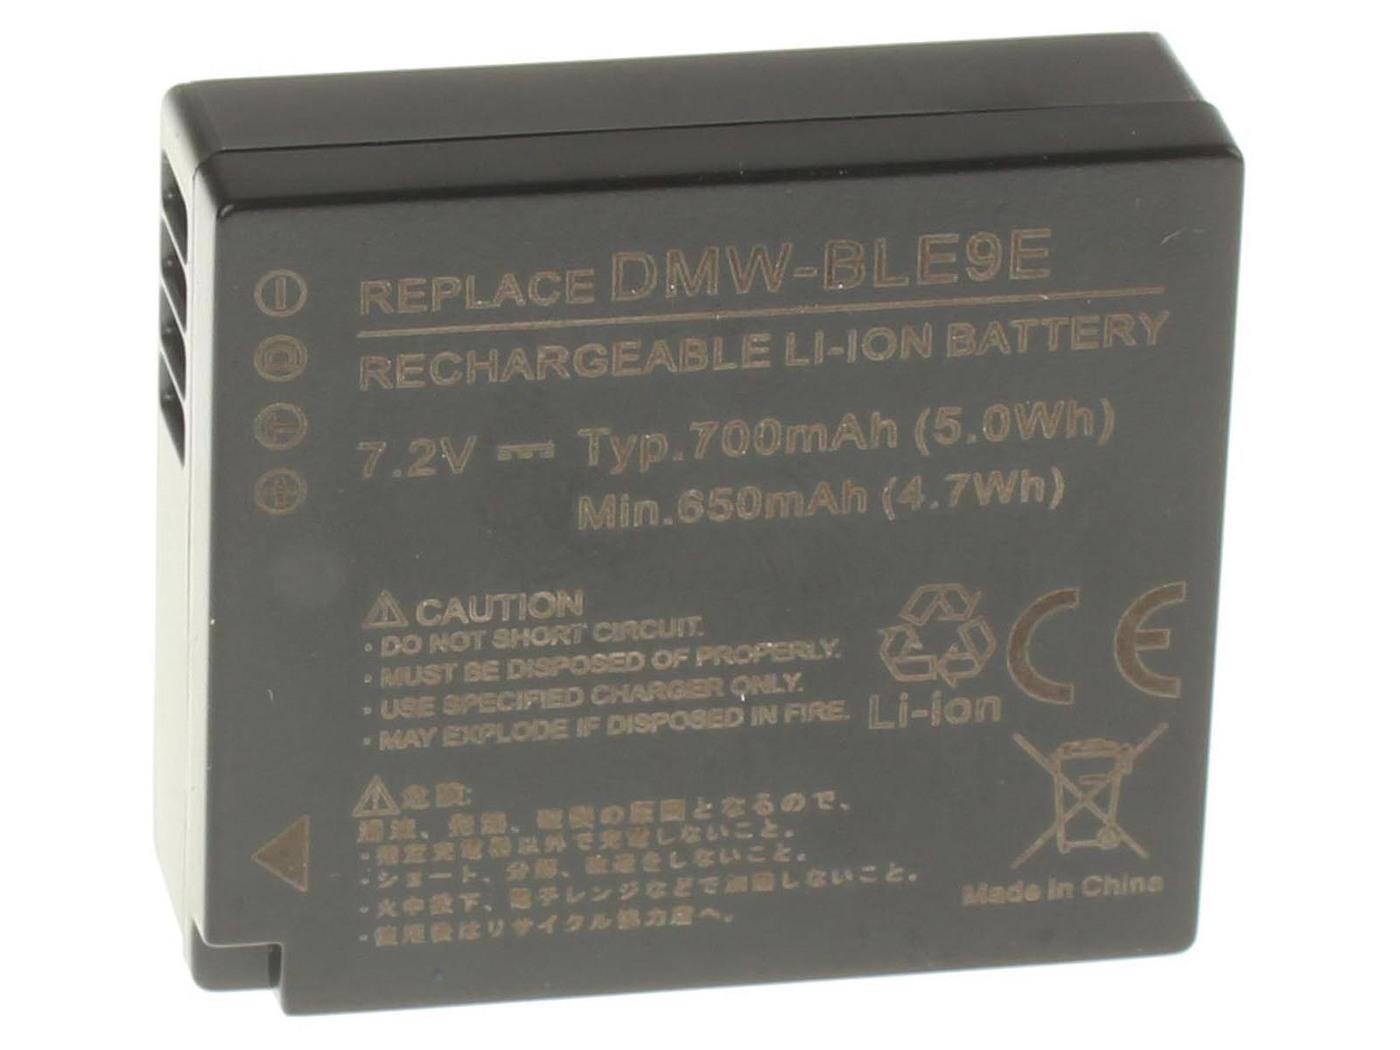 Аккумуляторная батарея iBatt iB-T1-F231 750mAh для камер Leica D-Lux (Typ 109),  для Panasonic Lumix DMC-LX100, Lumix DMC-GF3, Lumix DMC-GF5, Lumix DMC-GX7, Lumix DMC-GF6,